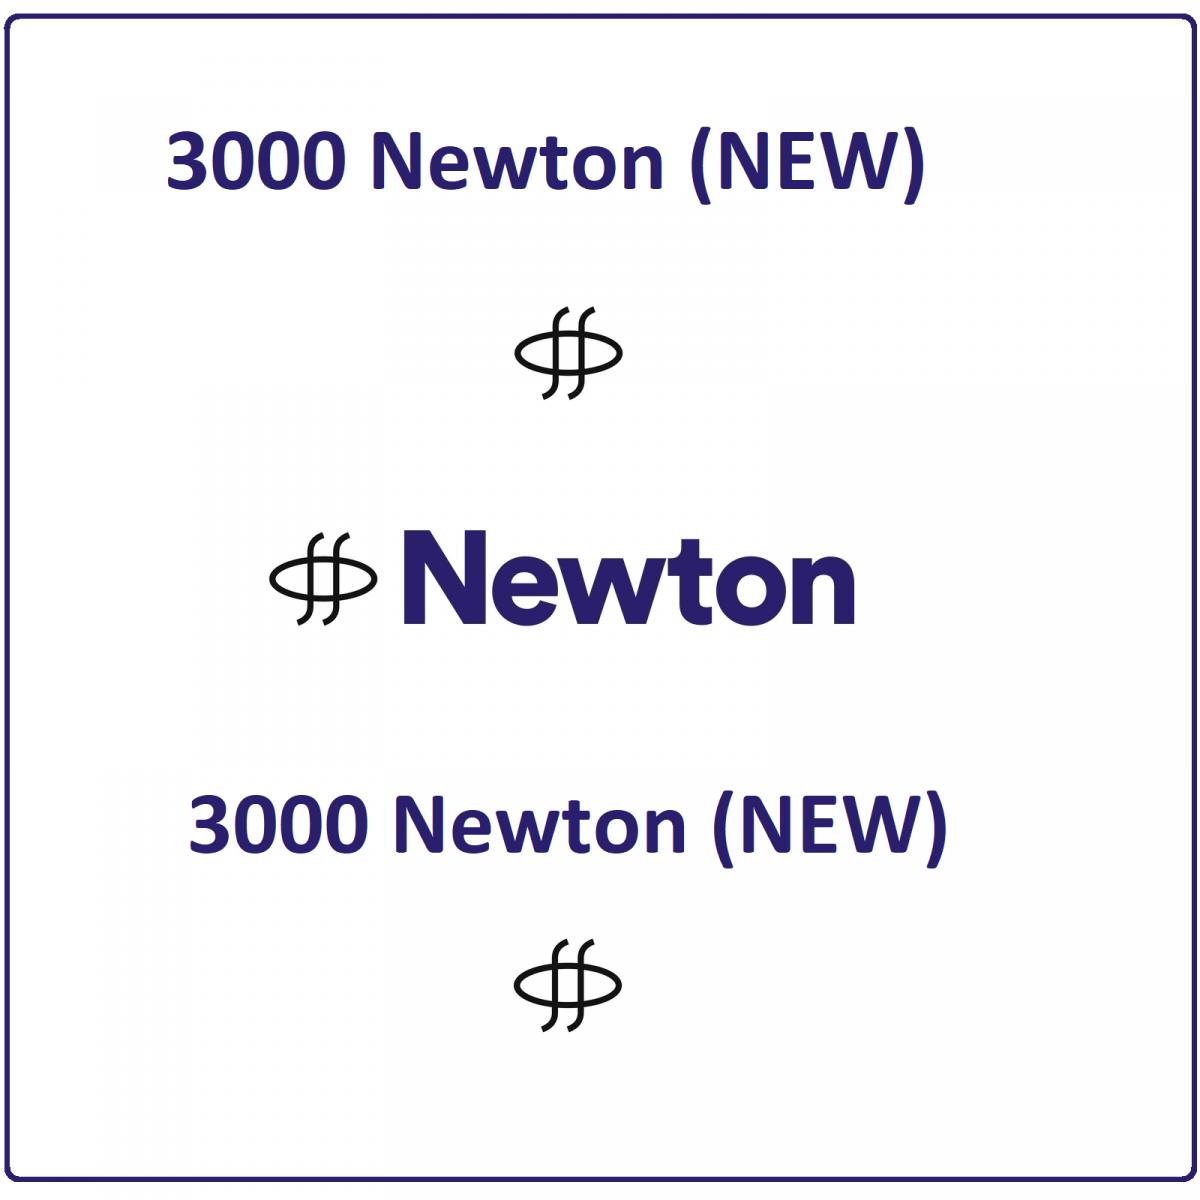 3000 Newton (NEW) Mining Contract